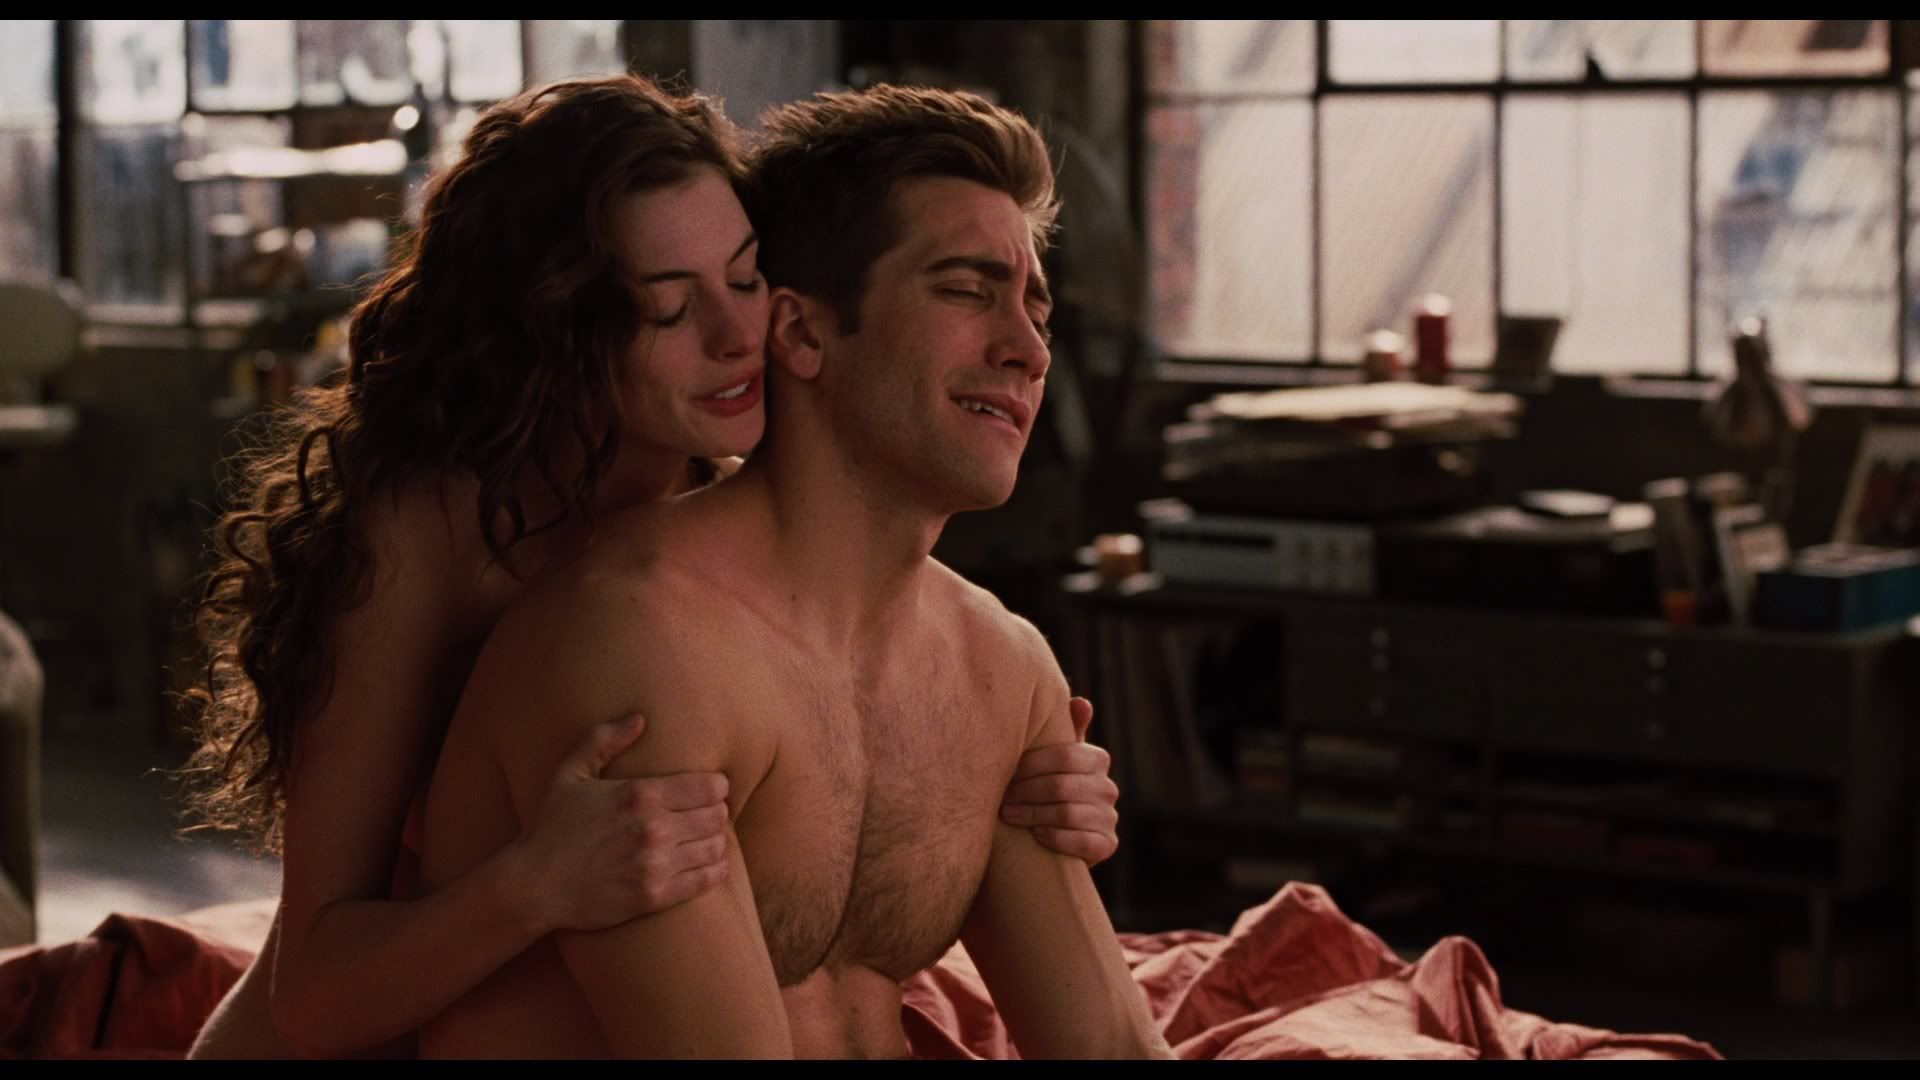 Movies filming sex scenes erections